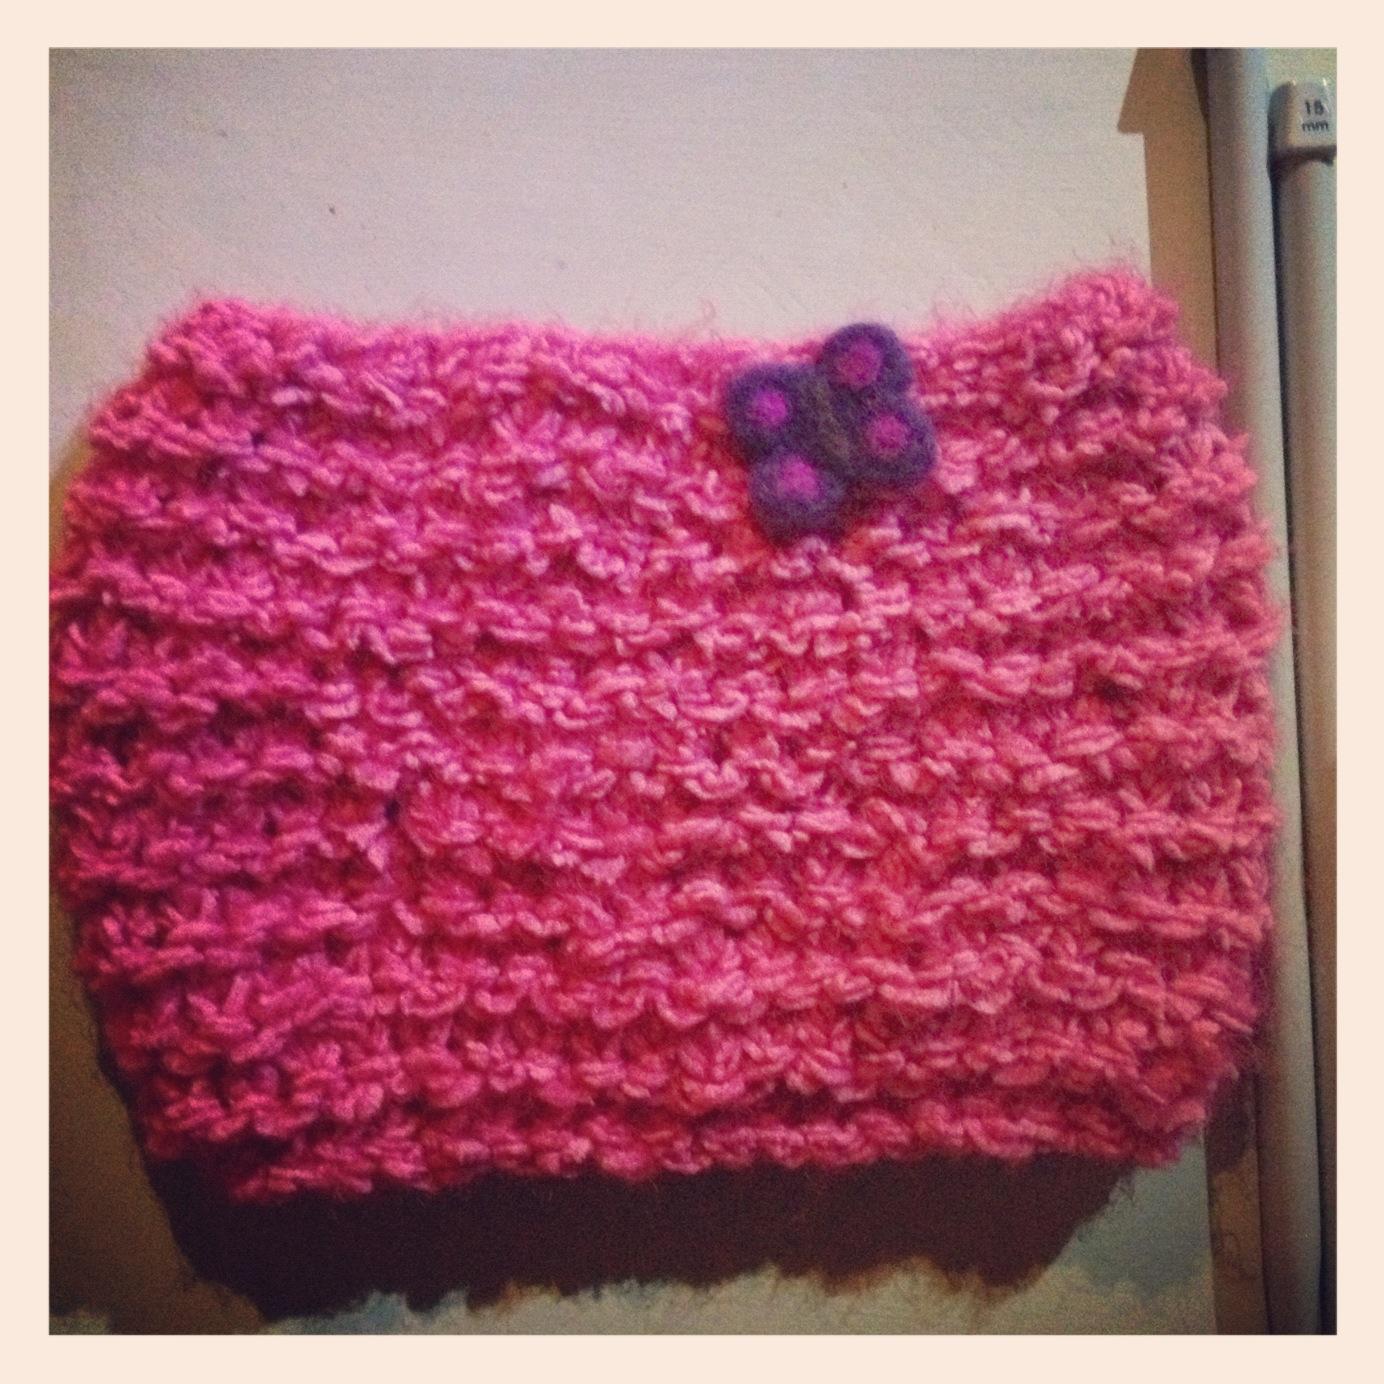 Modele tricot echarpe facile - Modele mitaine tricot facile ...